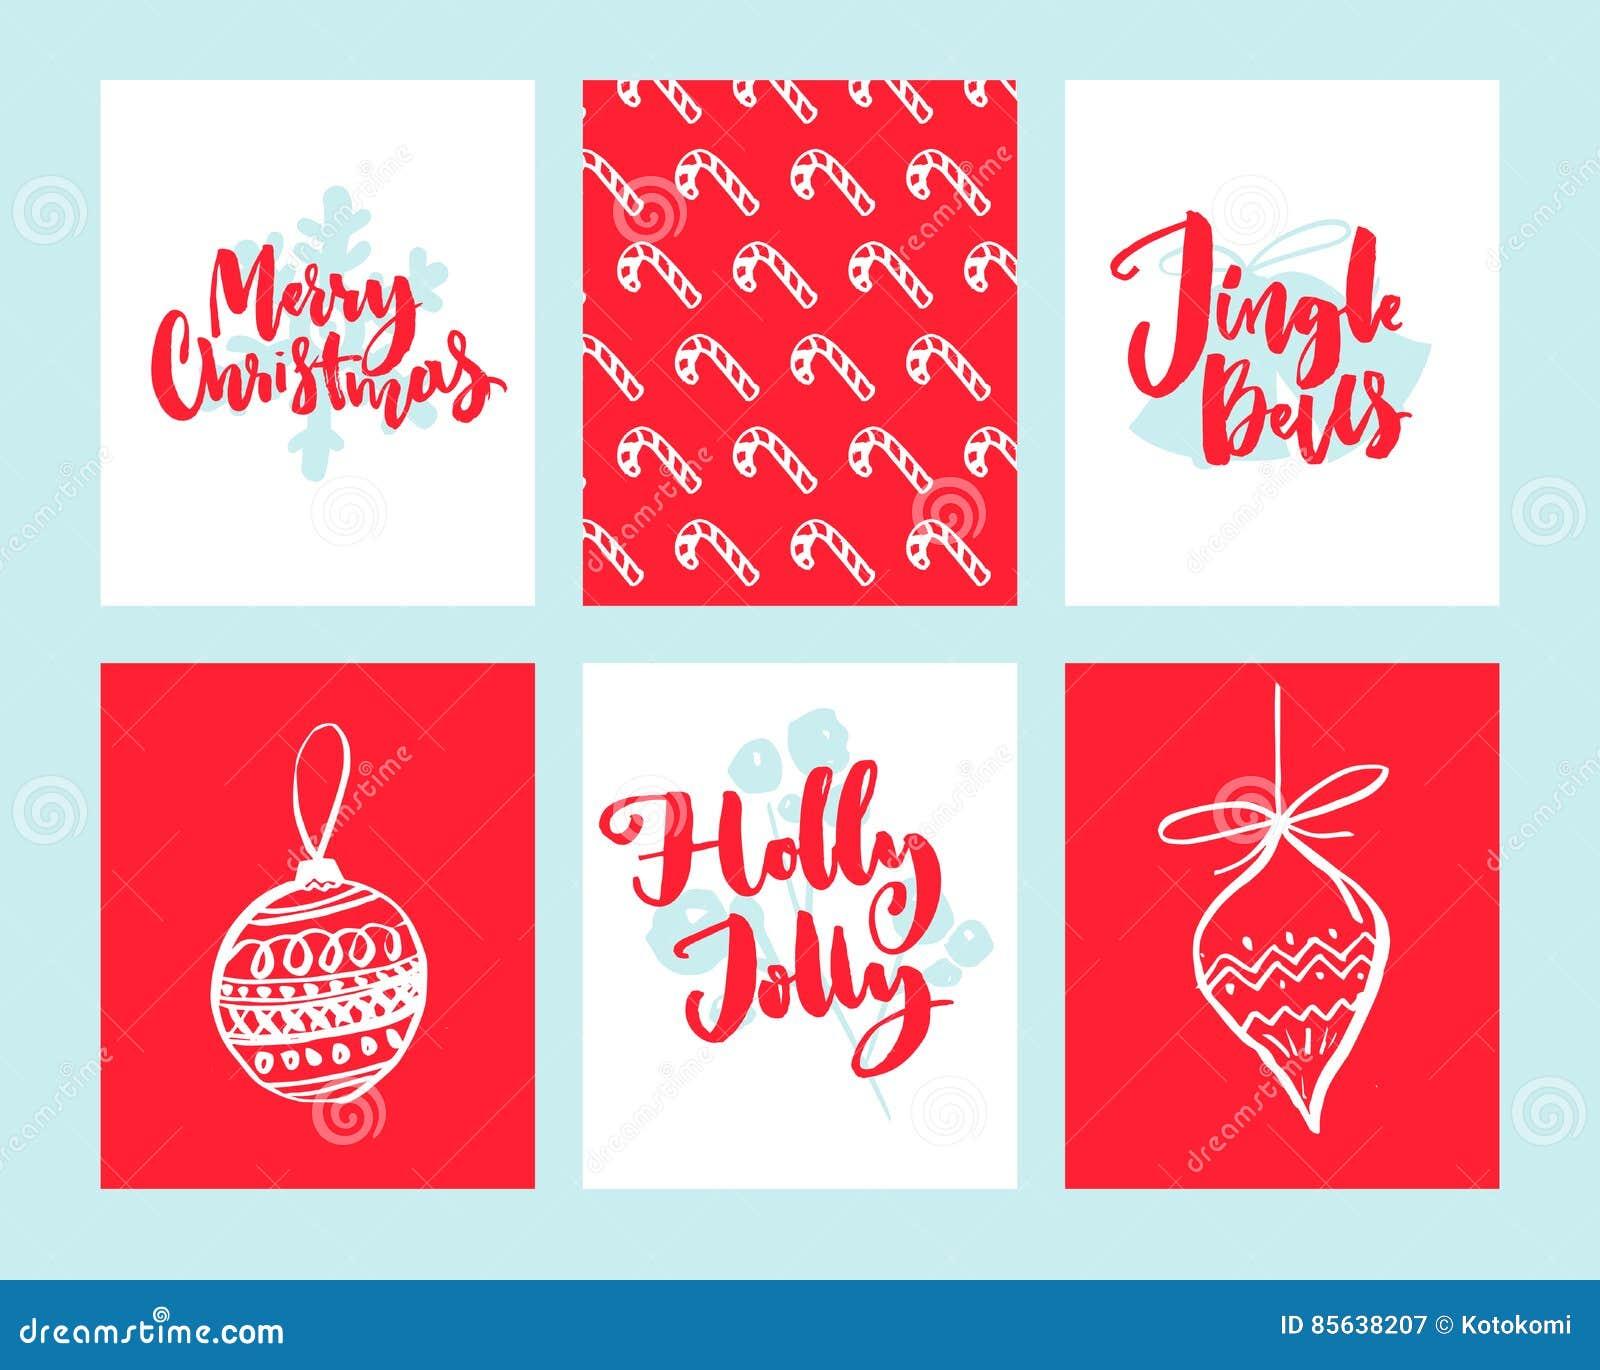 Merry Christmas Cards Set Of Winter Holidays Design Templates